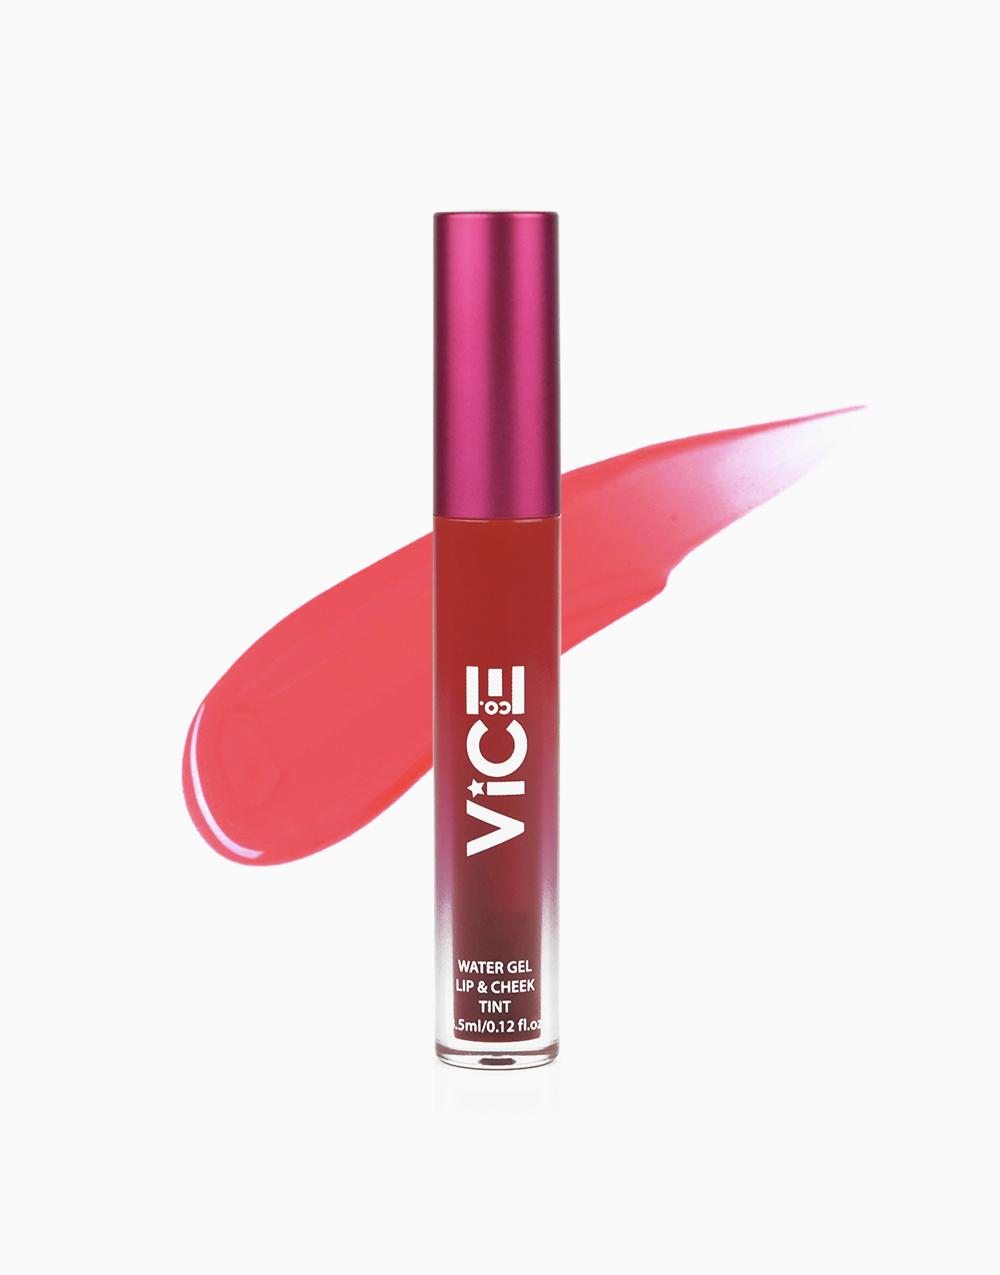 Lip & Cheek Tint (3.5ml) by Vice Cosmetics | Sisterette